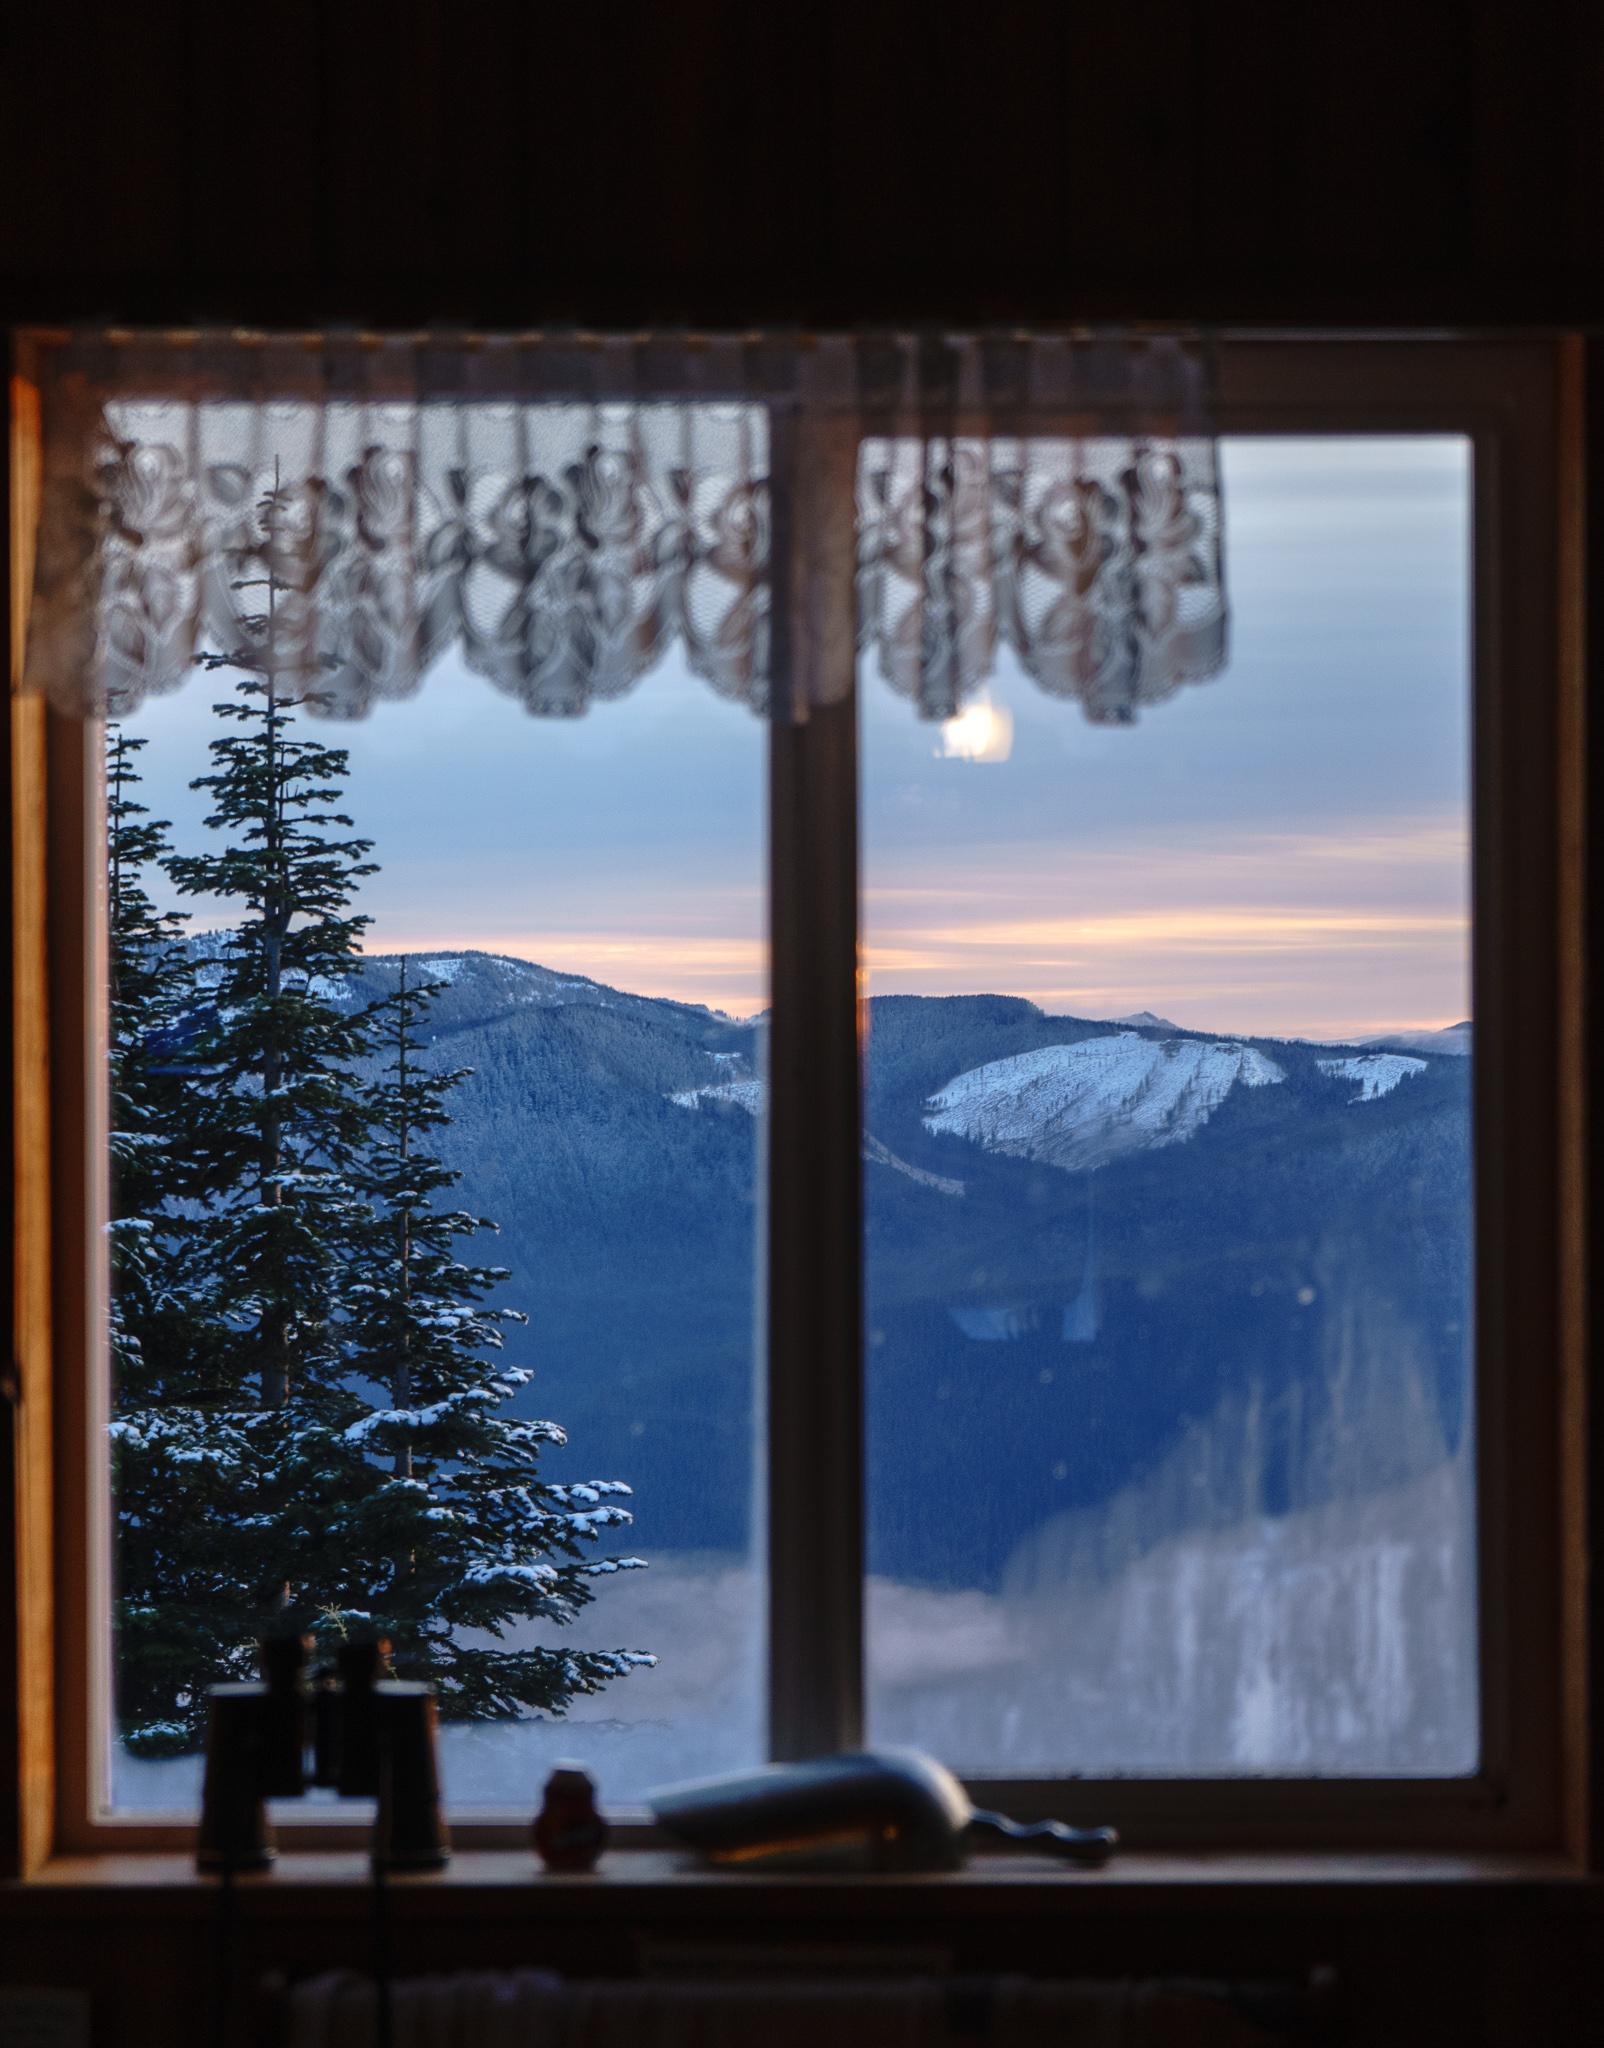 Mountain views out the kitchen window